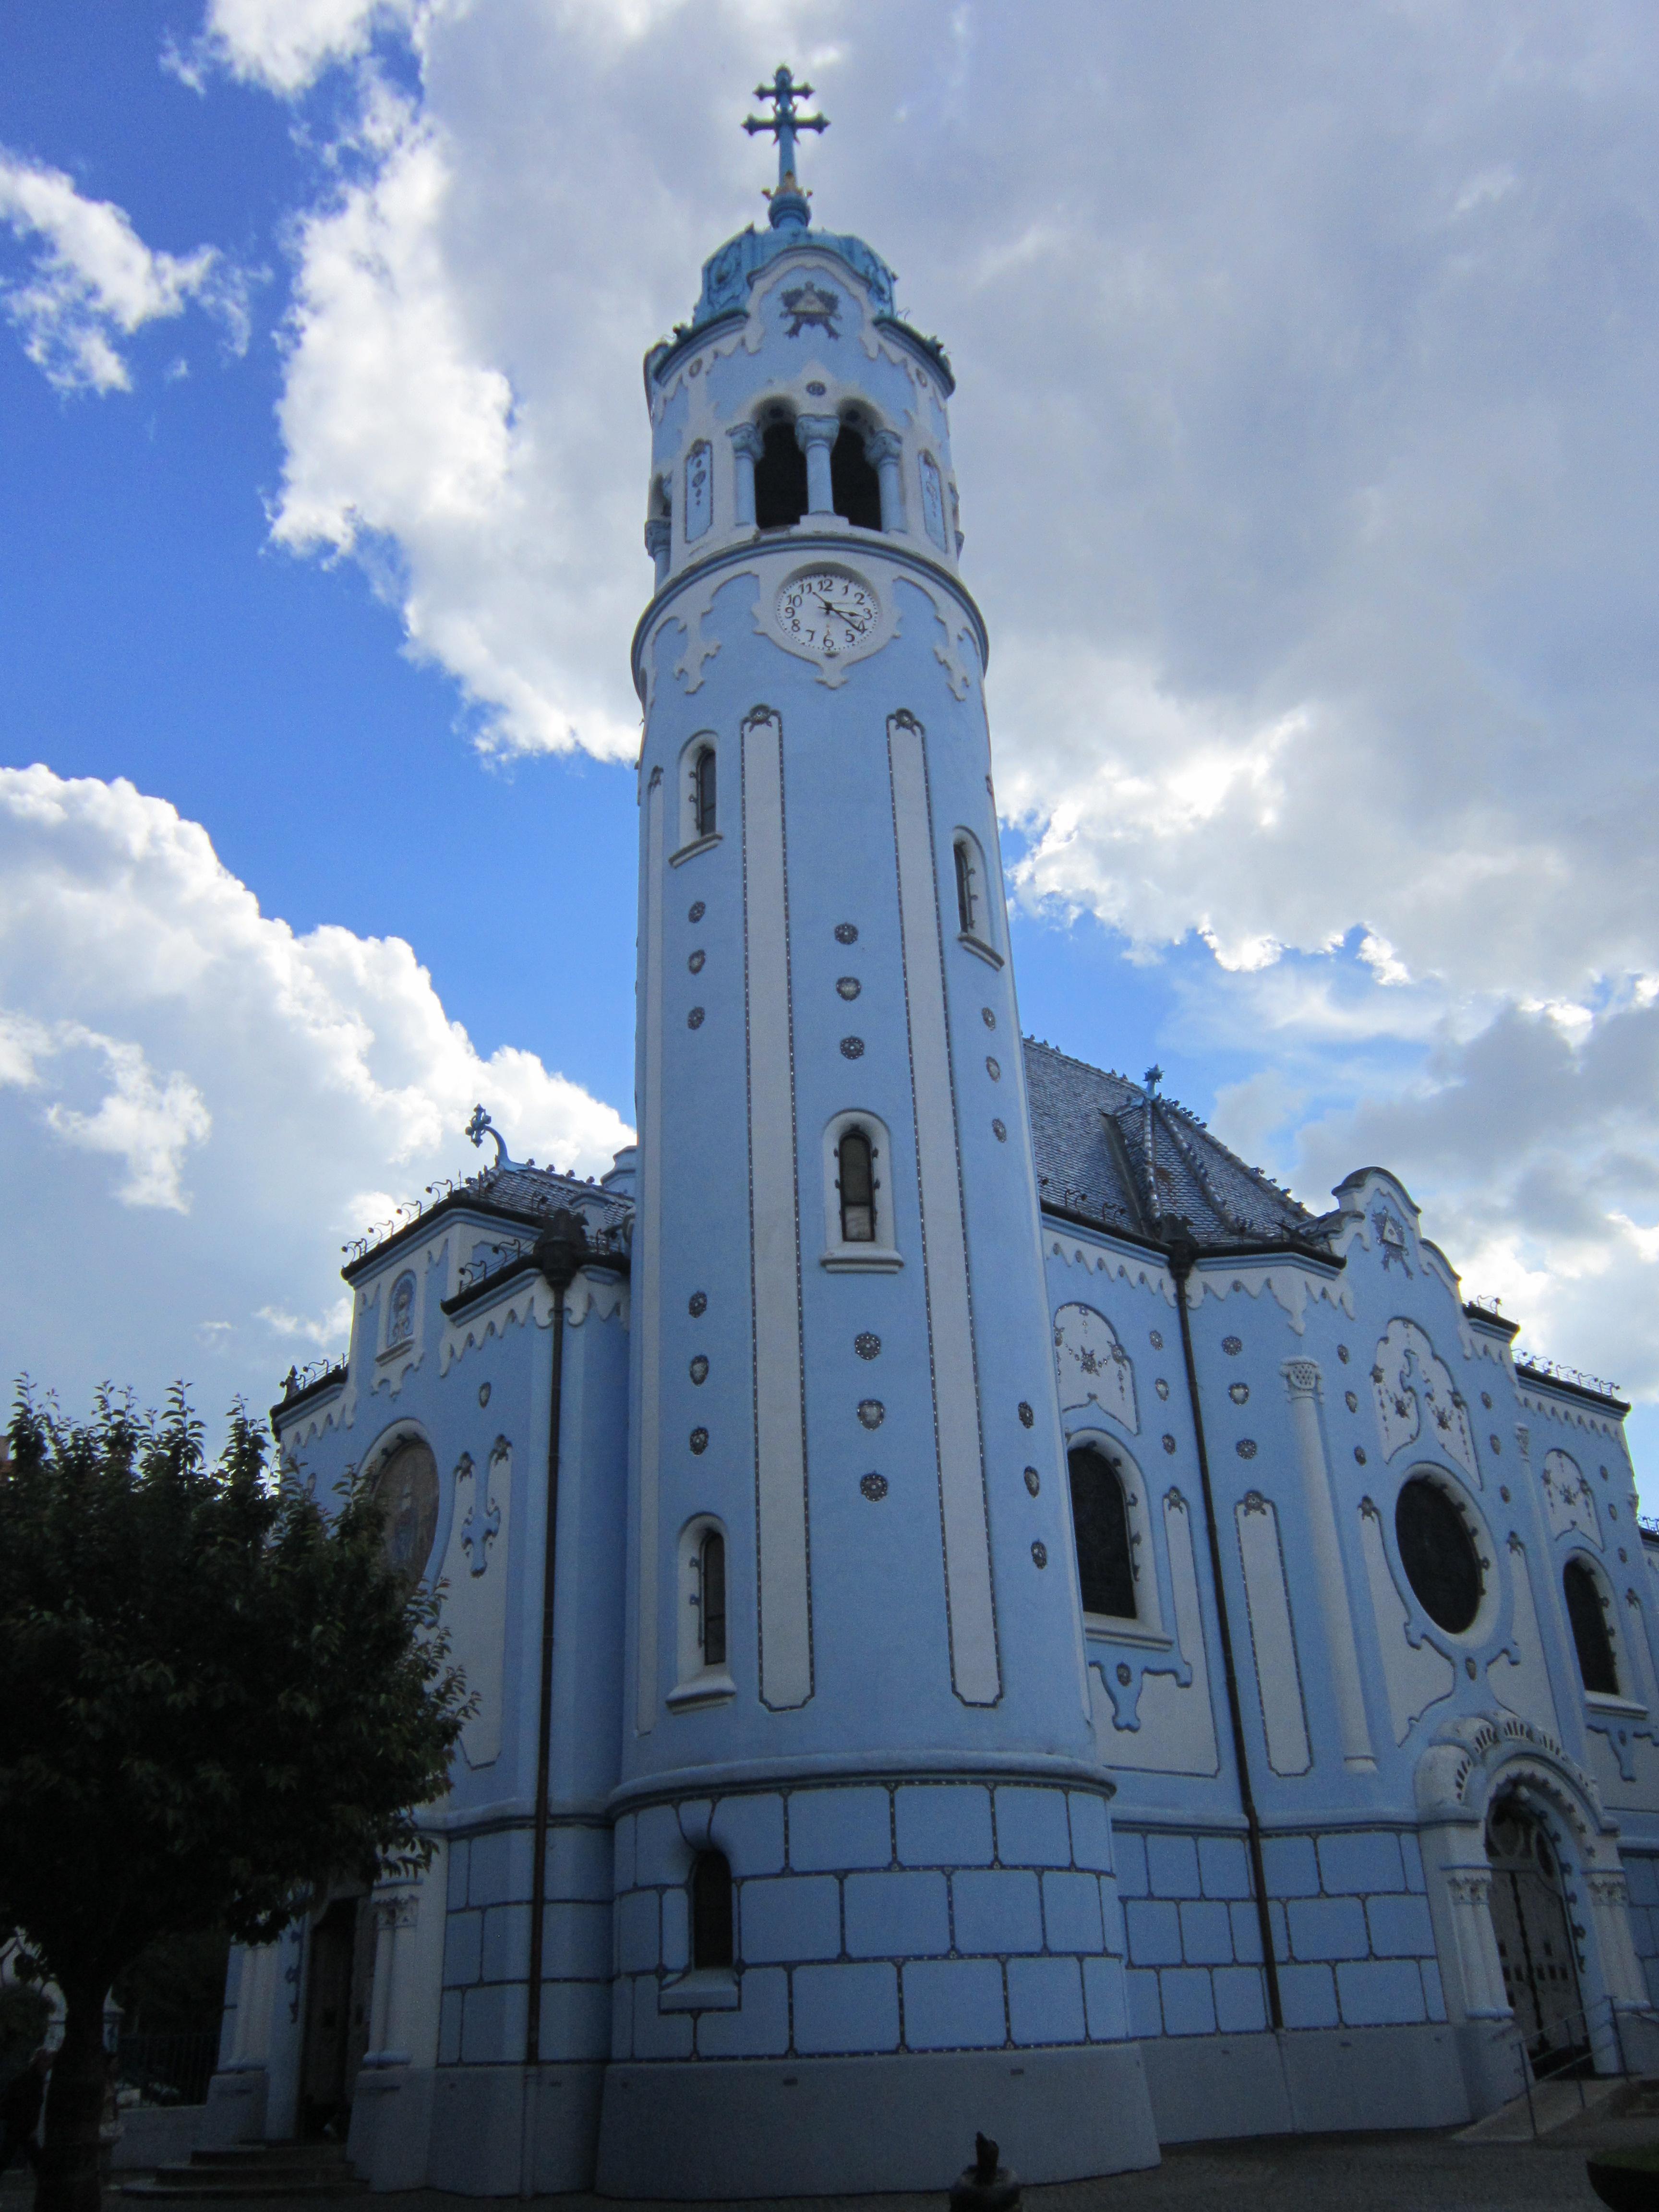 The Blue Church (Church of St. Elizabeth / Kostol svätej Alžbety)